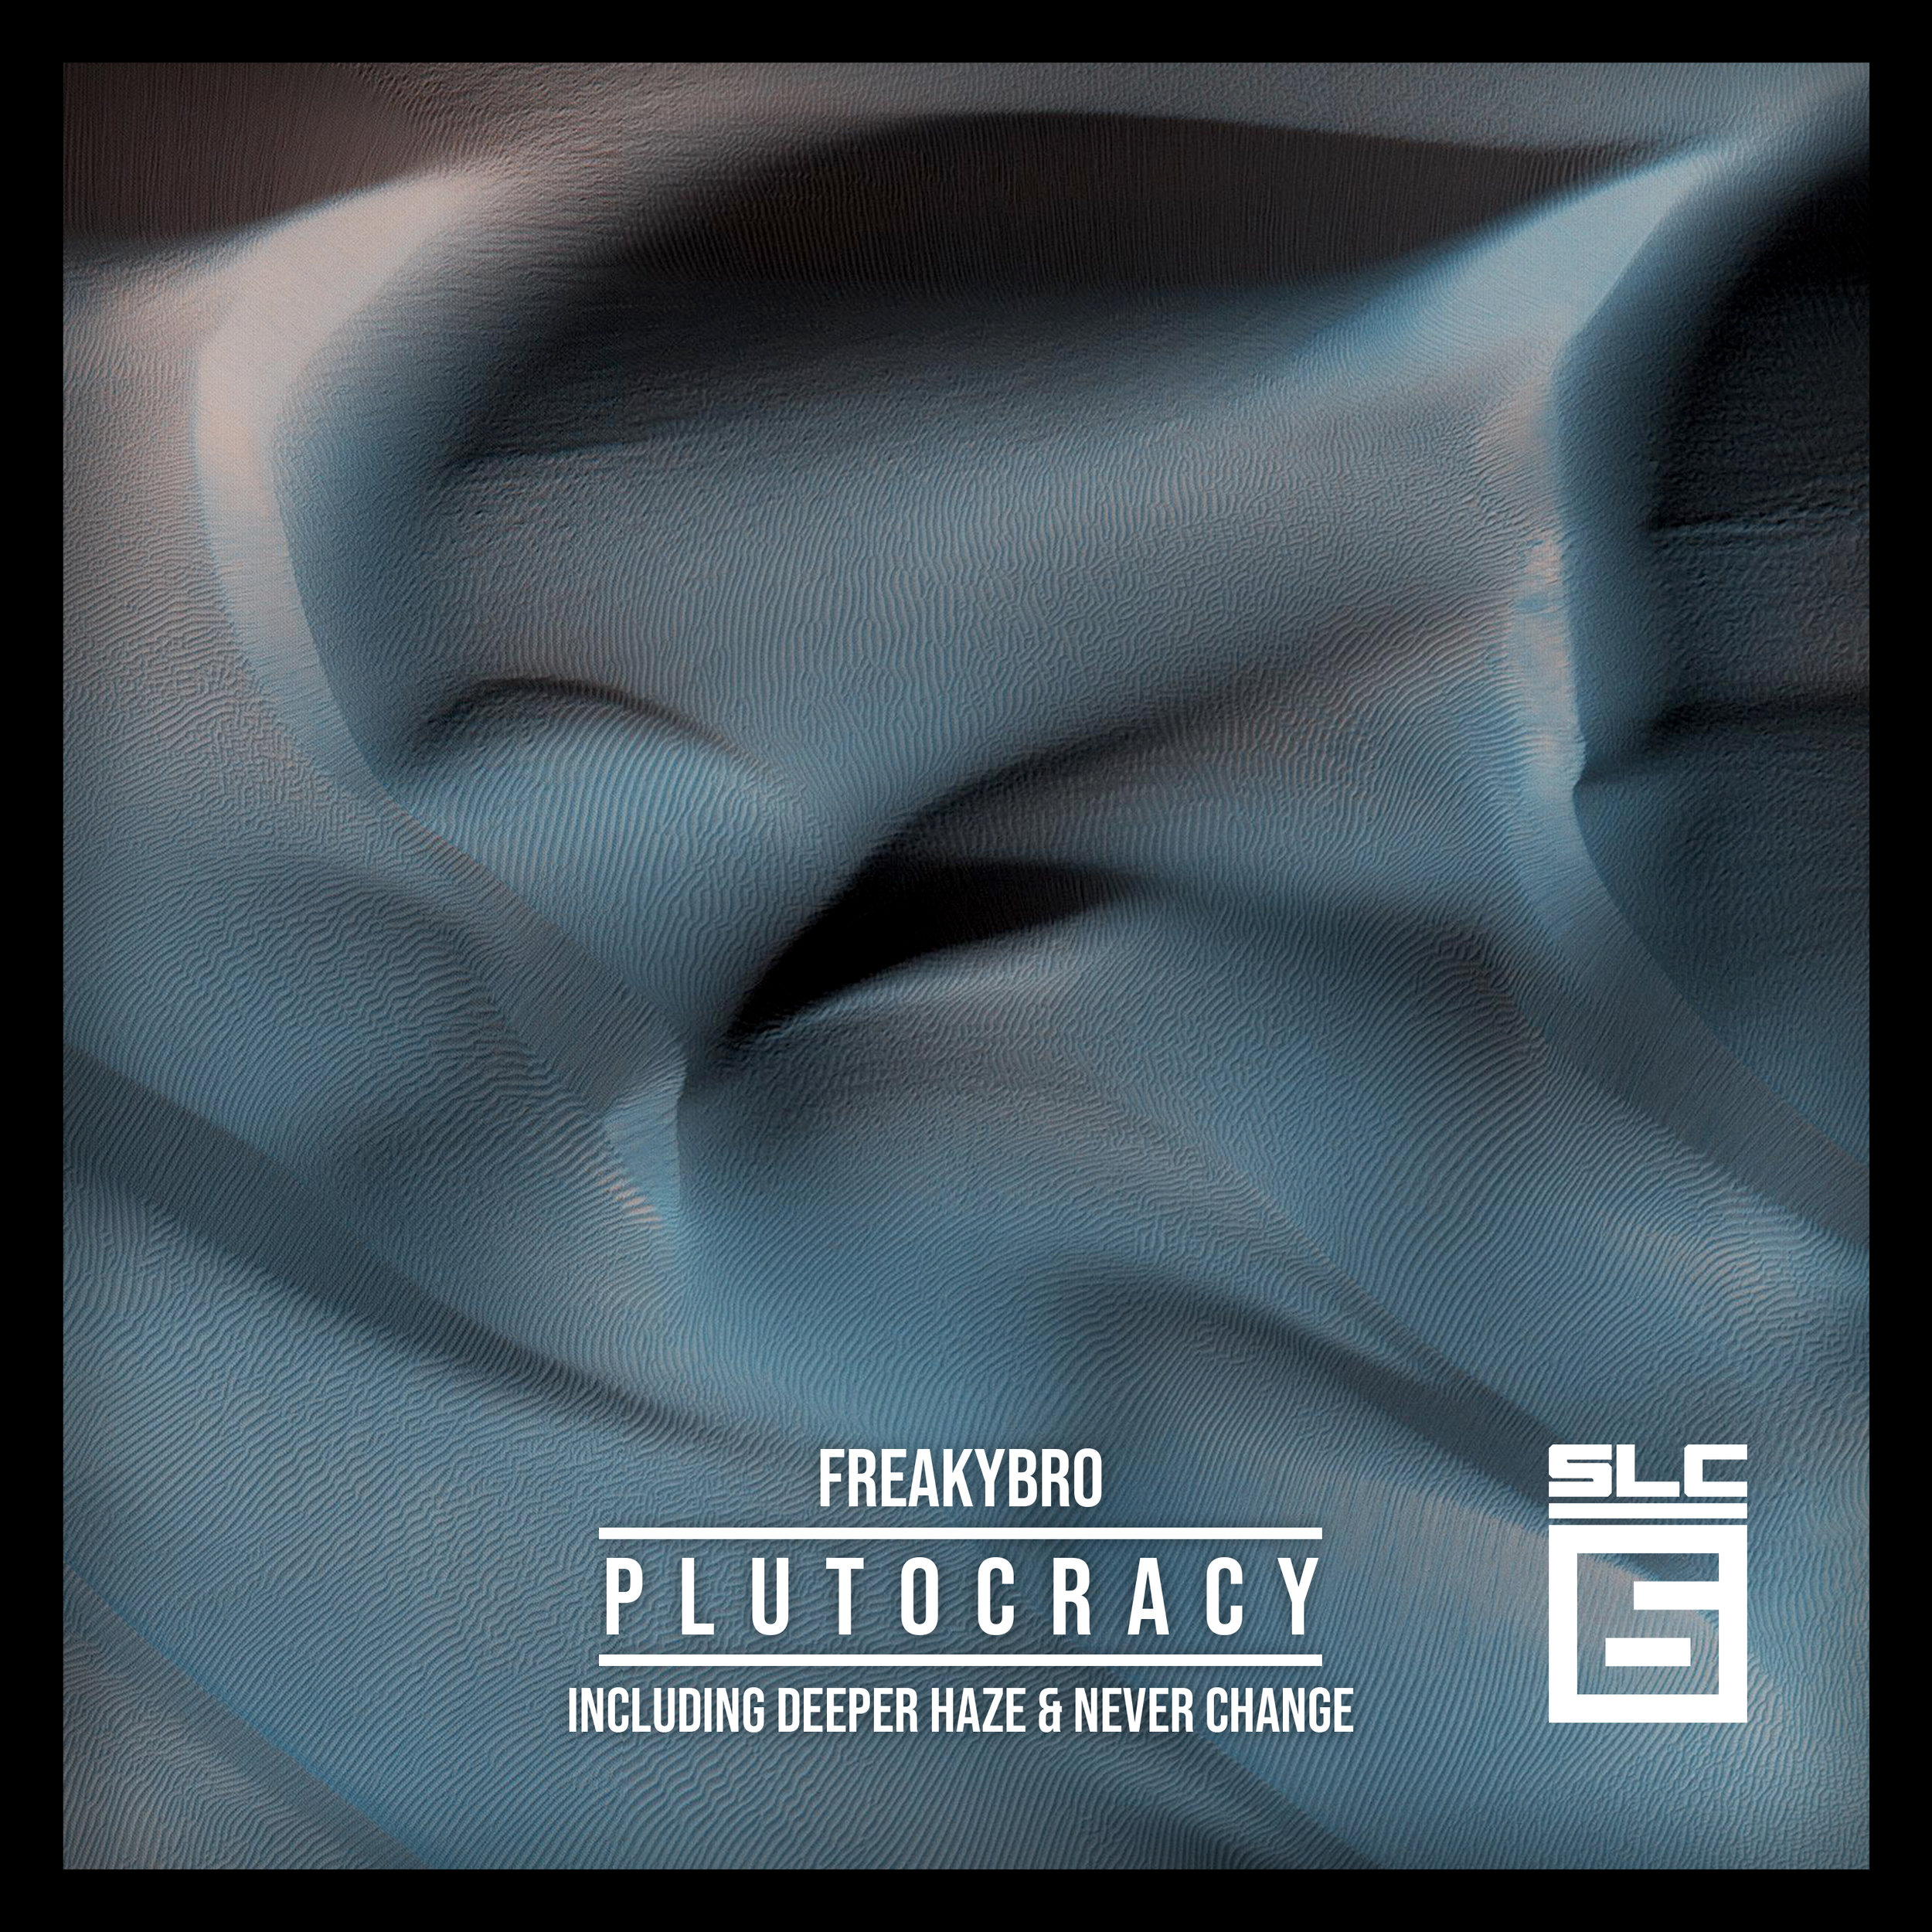 FreakyBro - Plutocracy